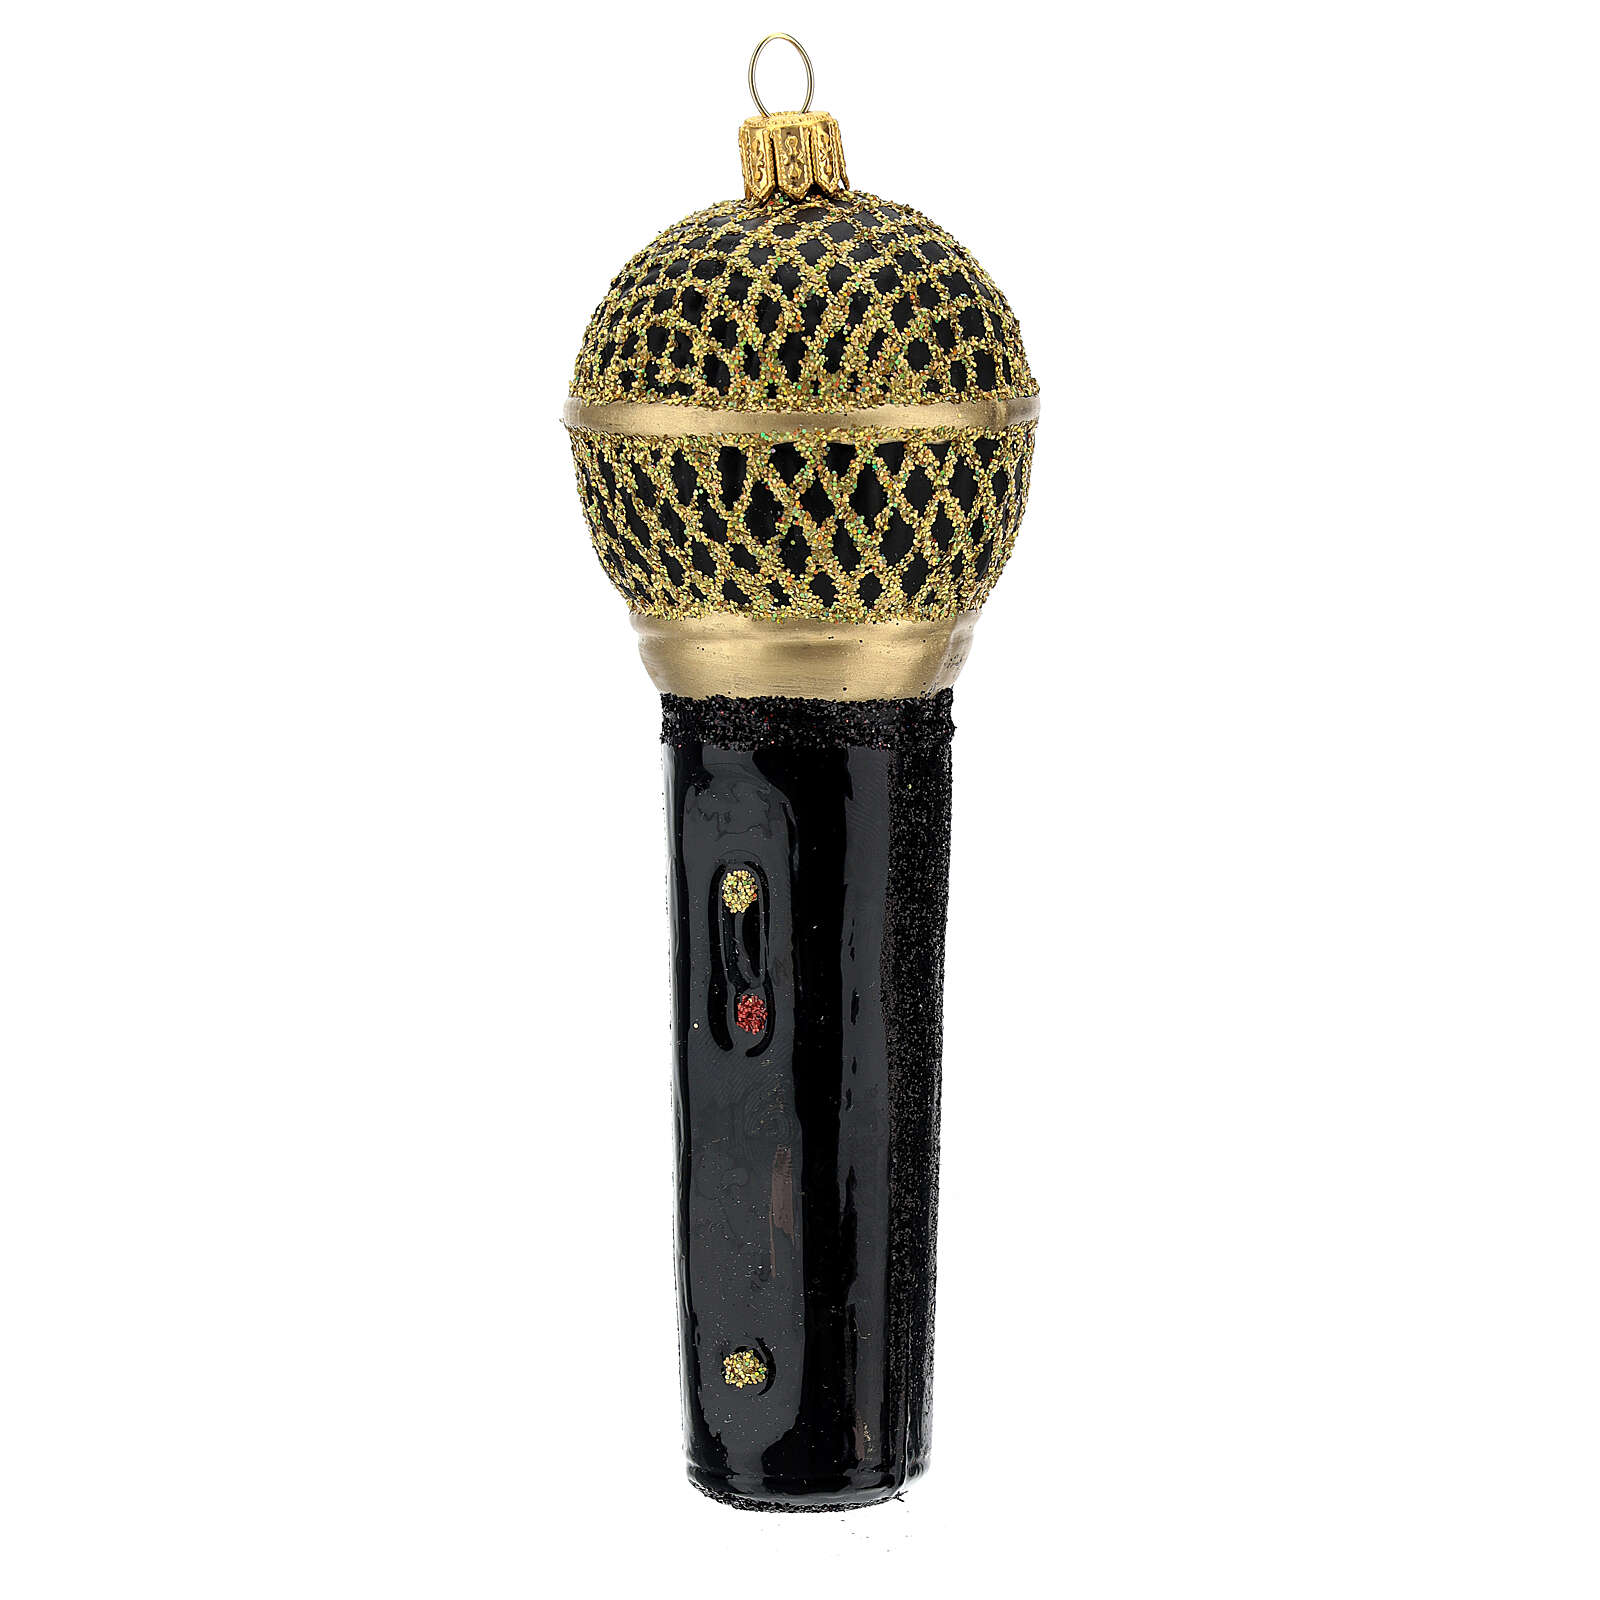 Microfone preto e ouro enfeite vidro soprado para árvore Natal 4